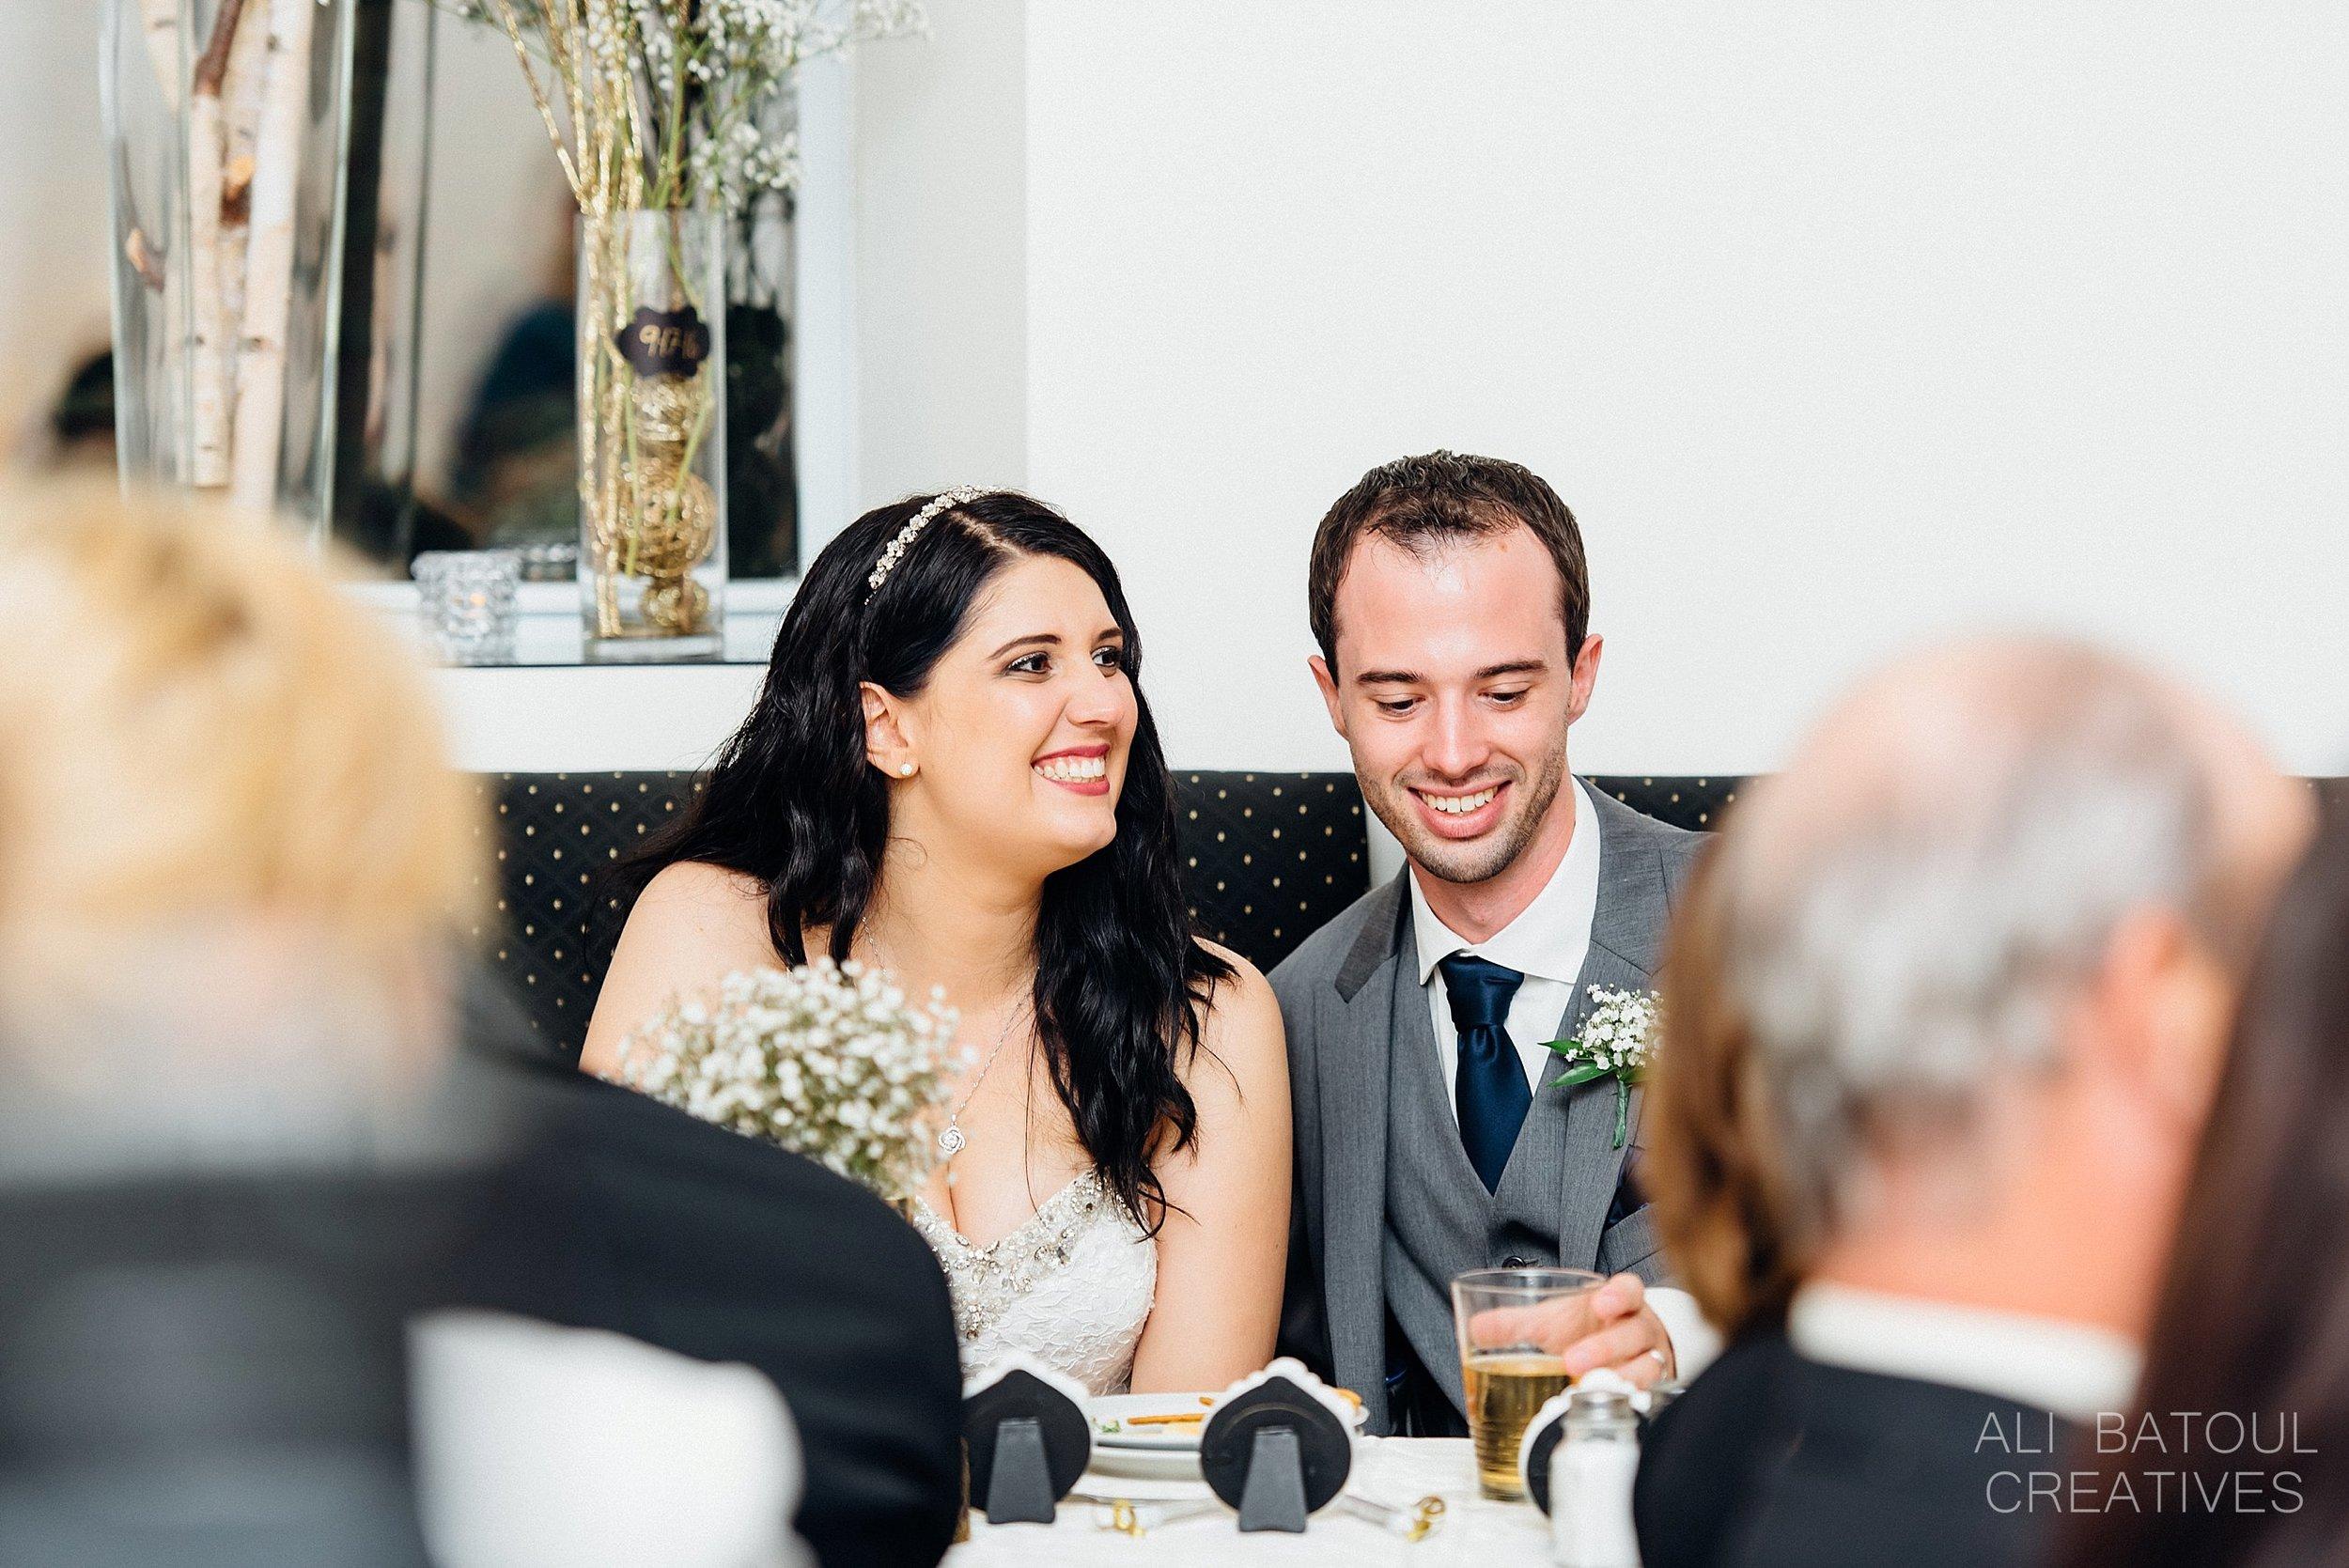 Jocelyn + Steve At The Schoolhouse Wedding - Ali and Batoul Fine Art Wedding Photography_0078.jpg